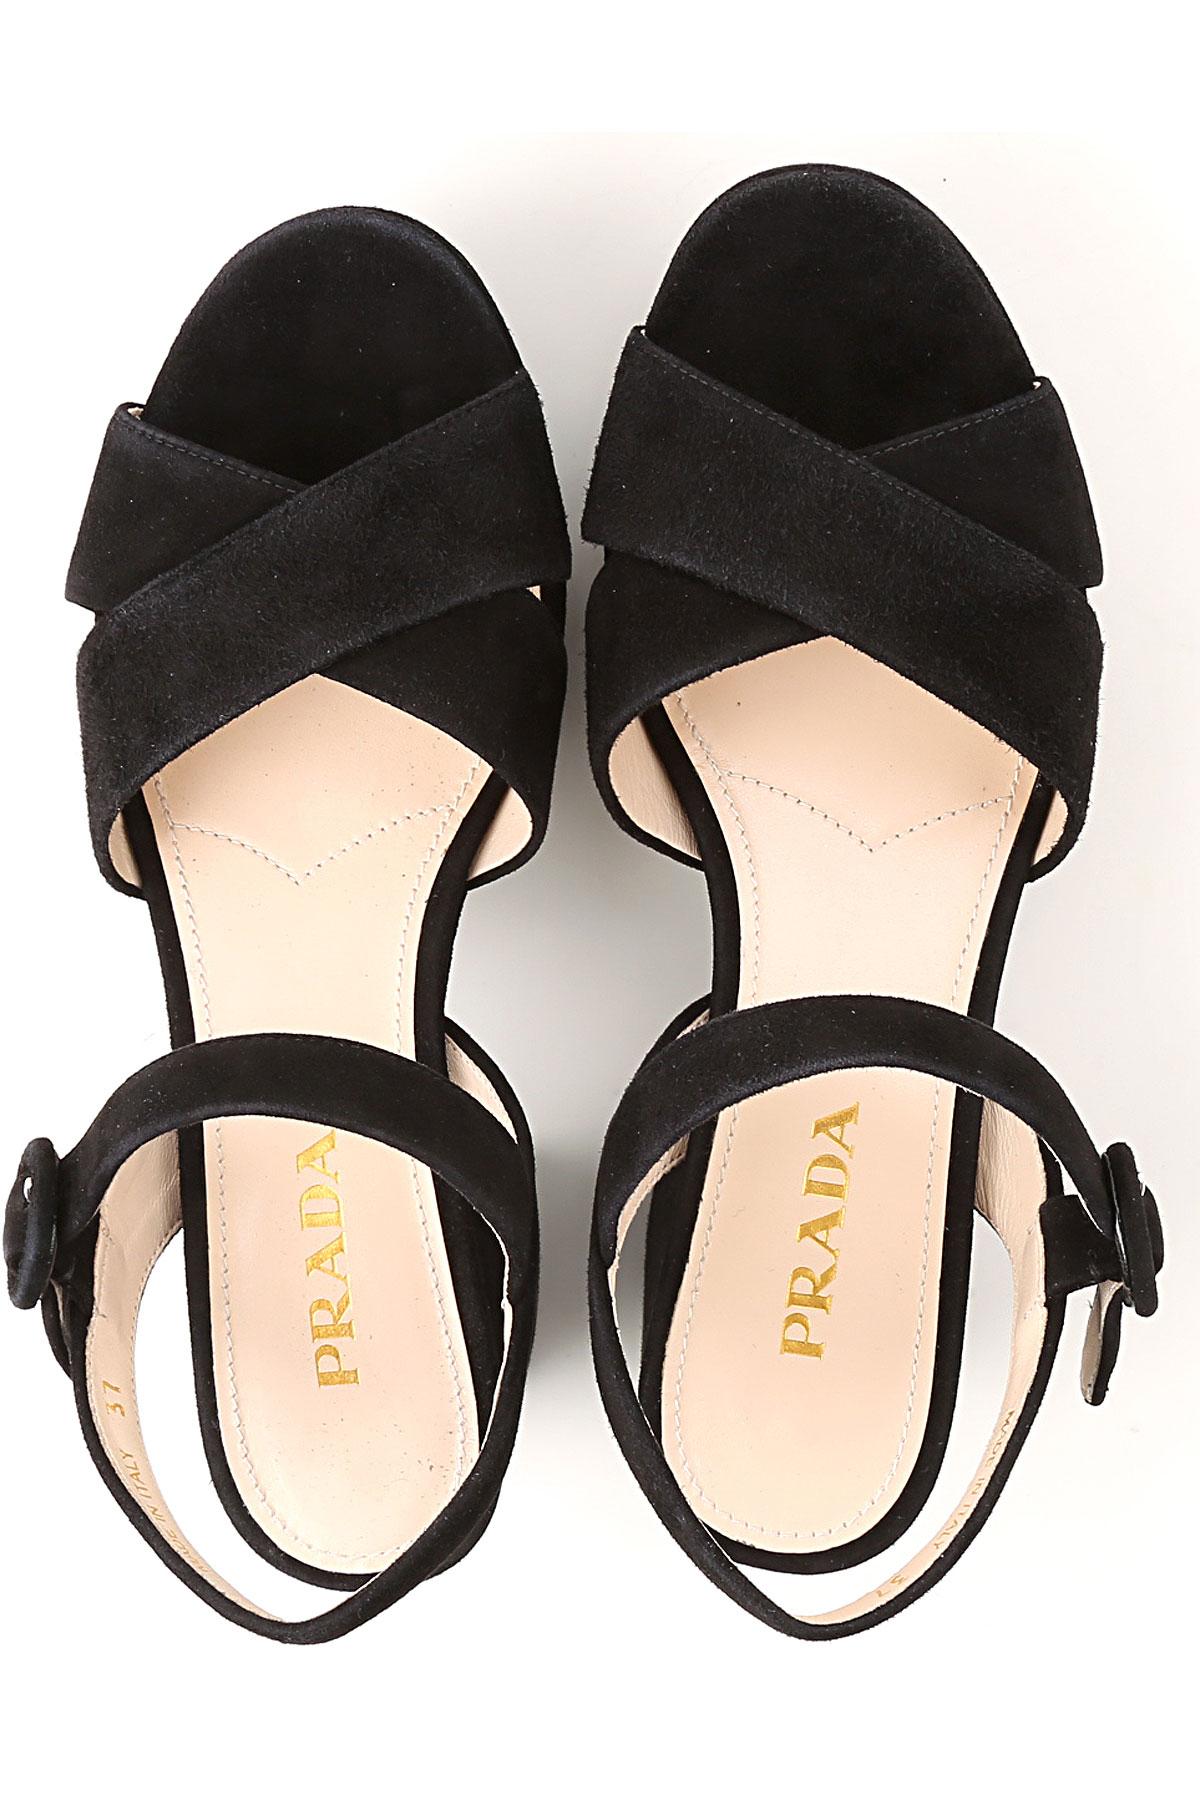 Mujer 2019 Negro Zapatos Para nbsp; verano Primavera Prada UwZaEq6n